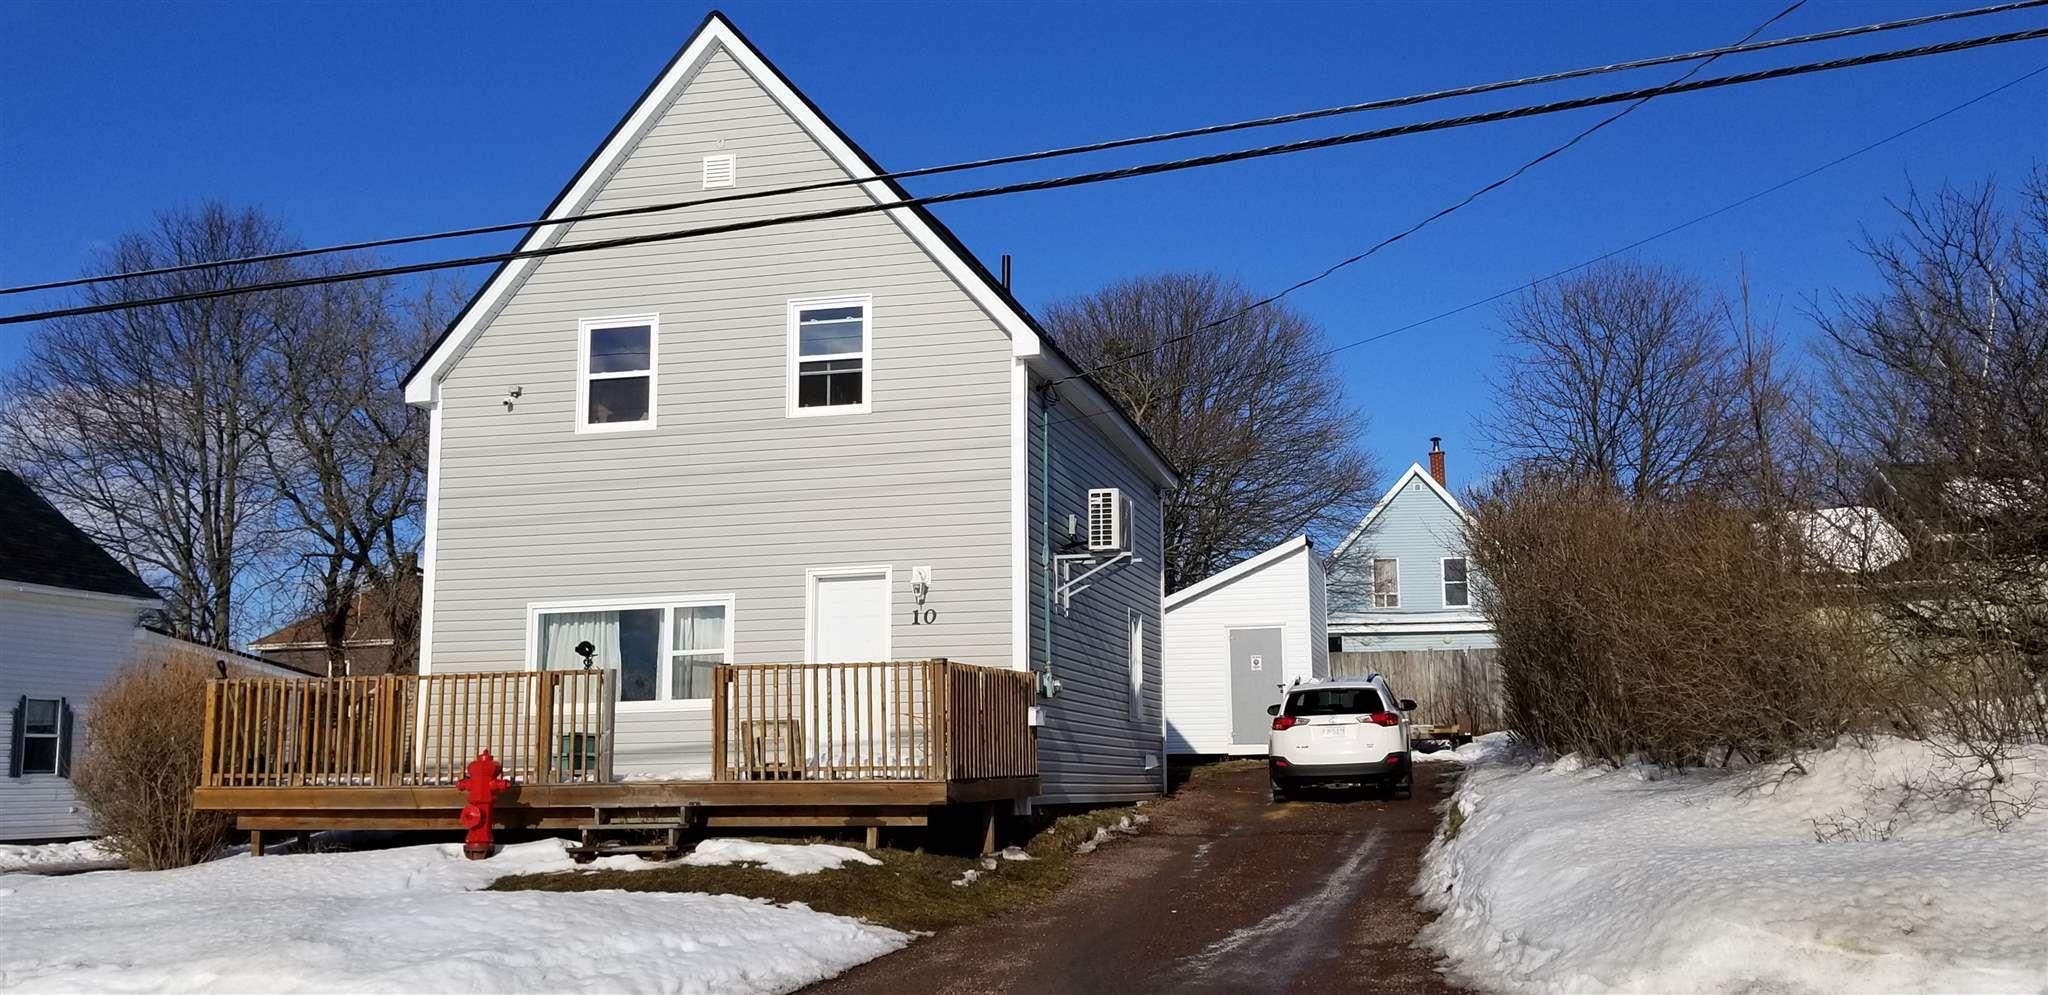 Main Photo: 10 Hill Street in Amherst: 101-Amherst,Brookdale,Warren Residential for sale (Northern Region)  : MLS®# 202103527